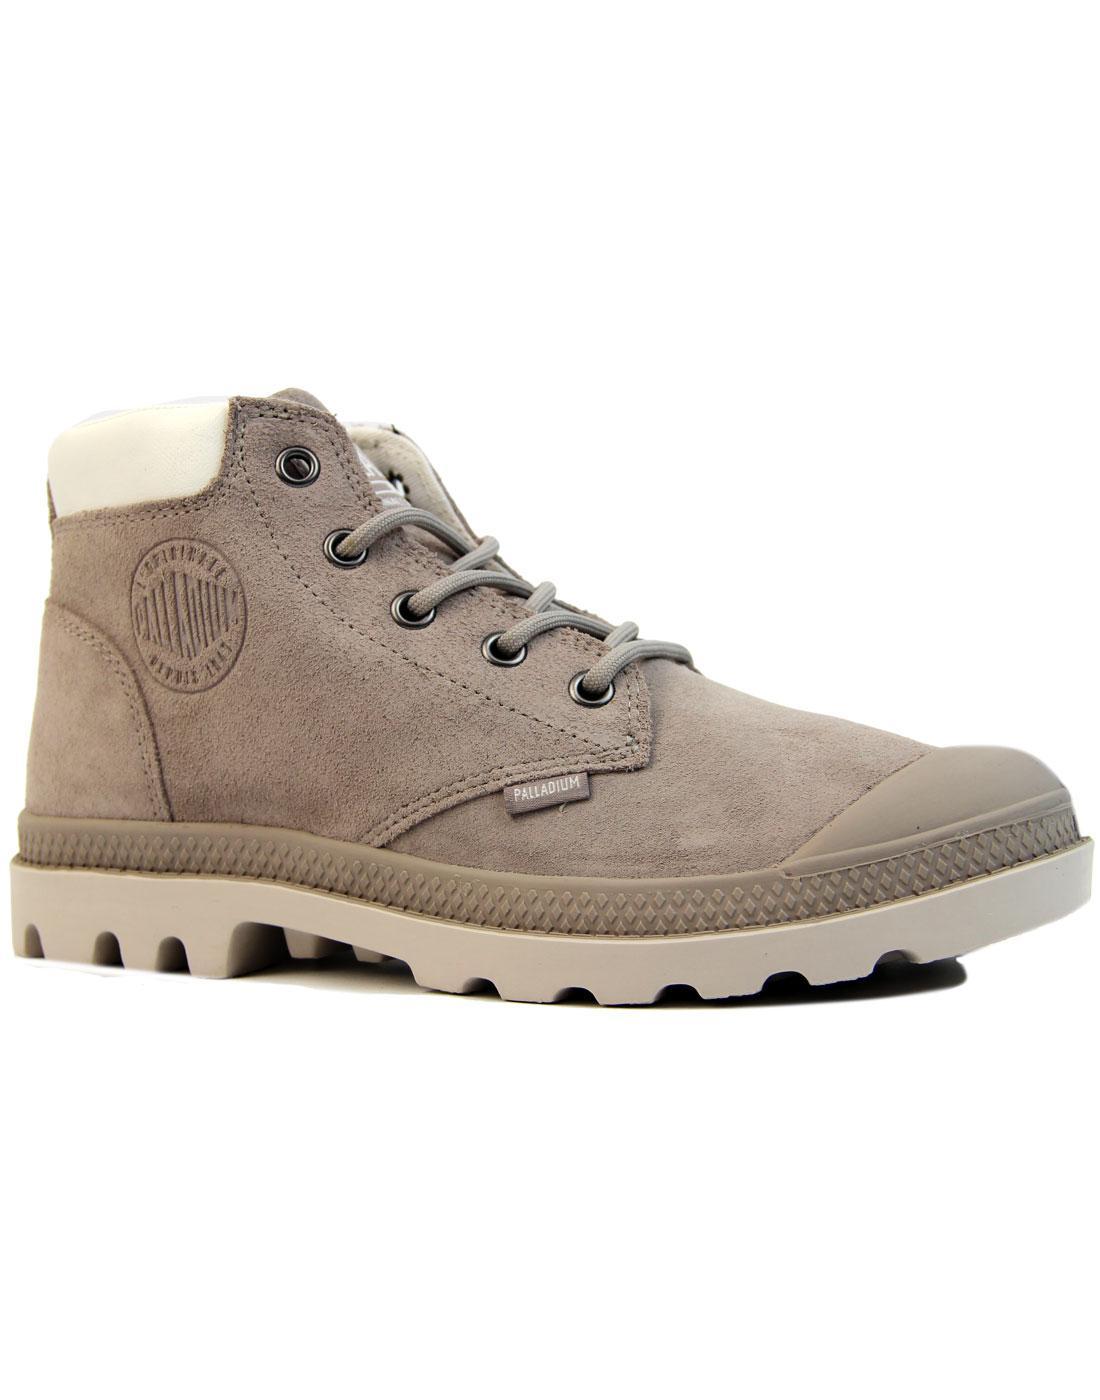 Pampa Lo Cuff PALLADIUM Retro Mid Suede Boots (SG)